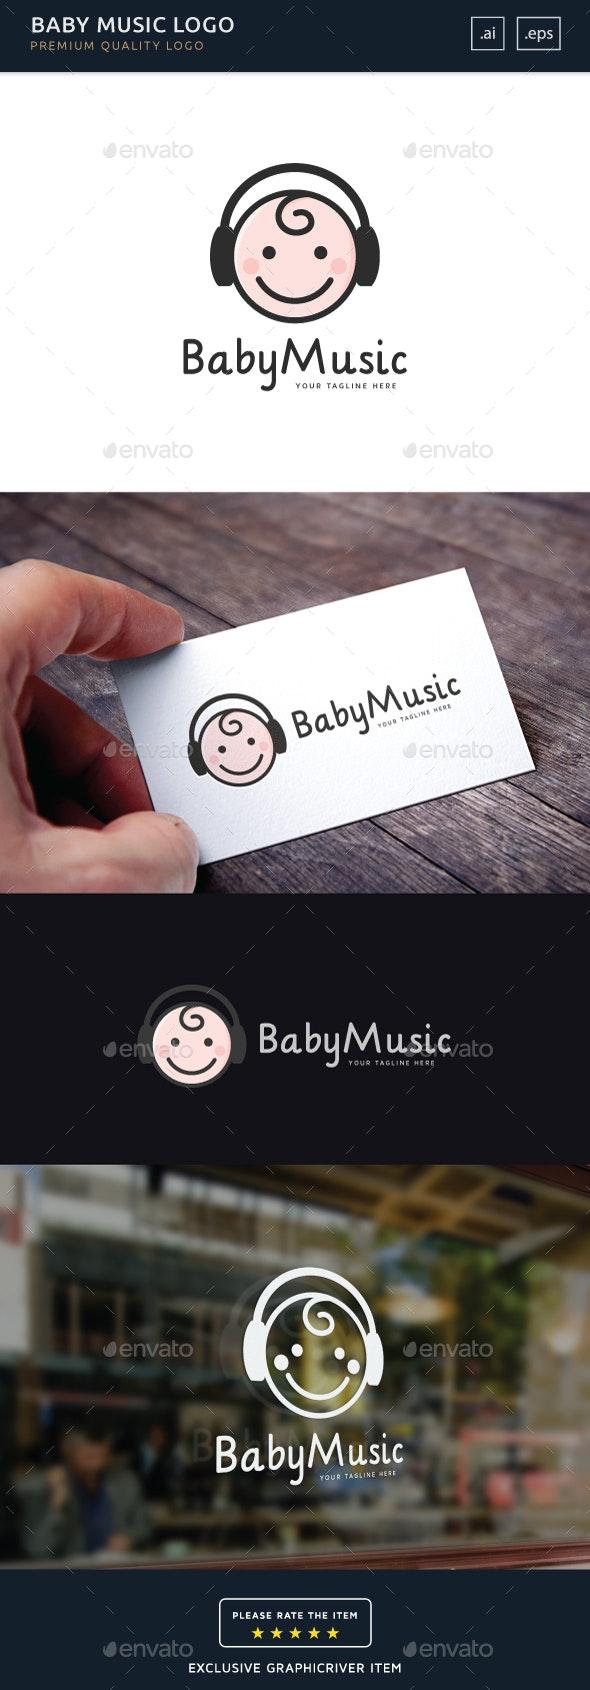 Baby Music - Logo Template - Humans Logo Templates